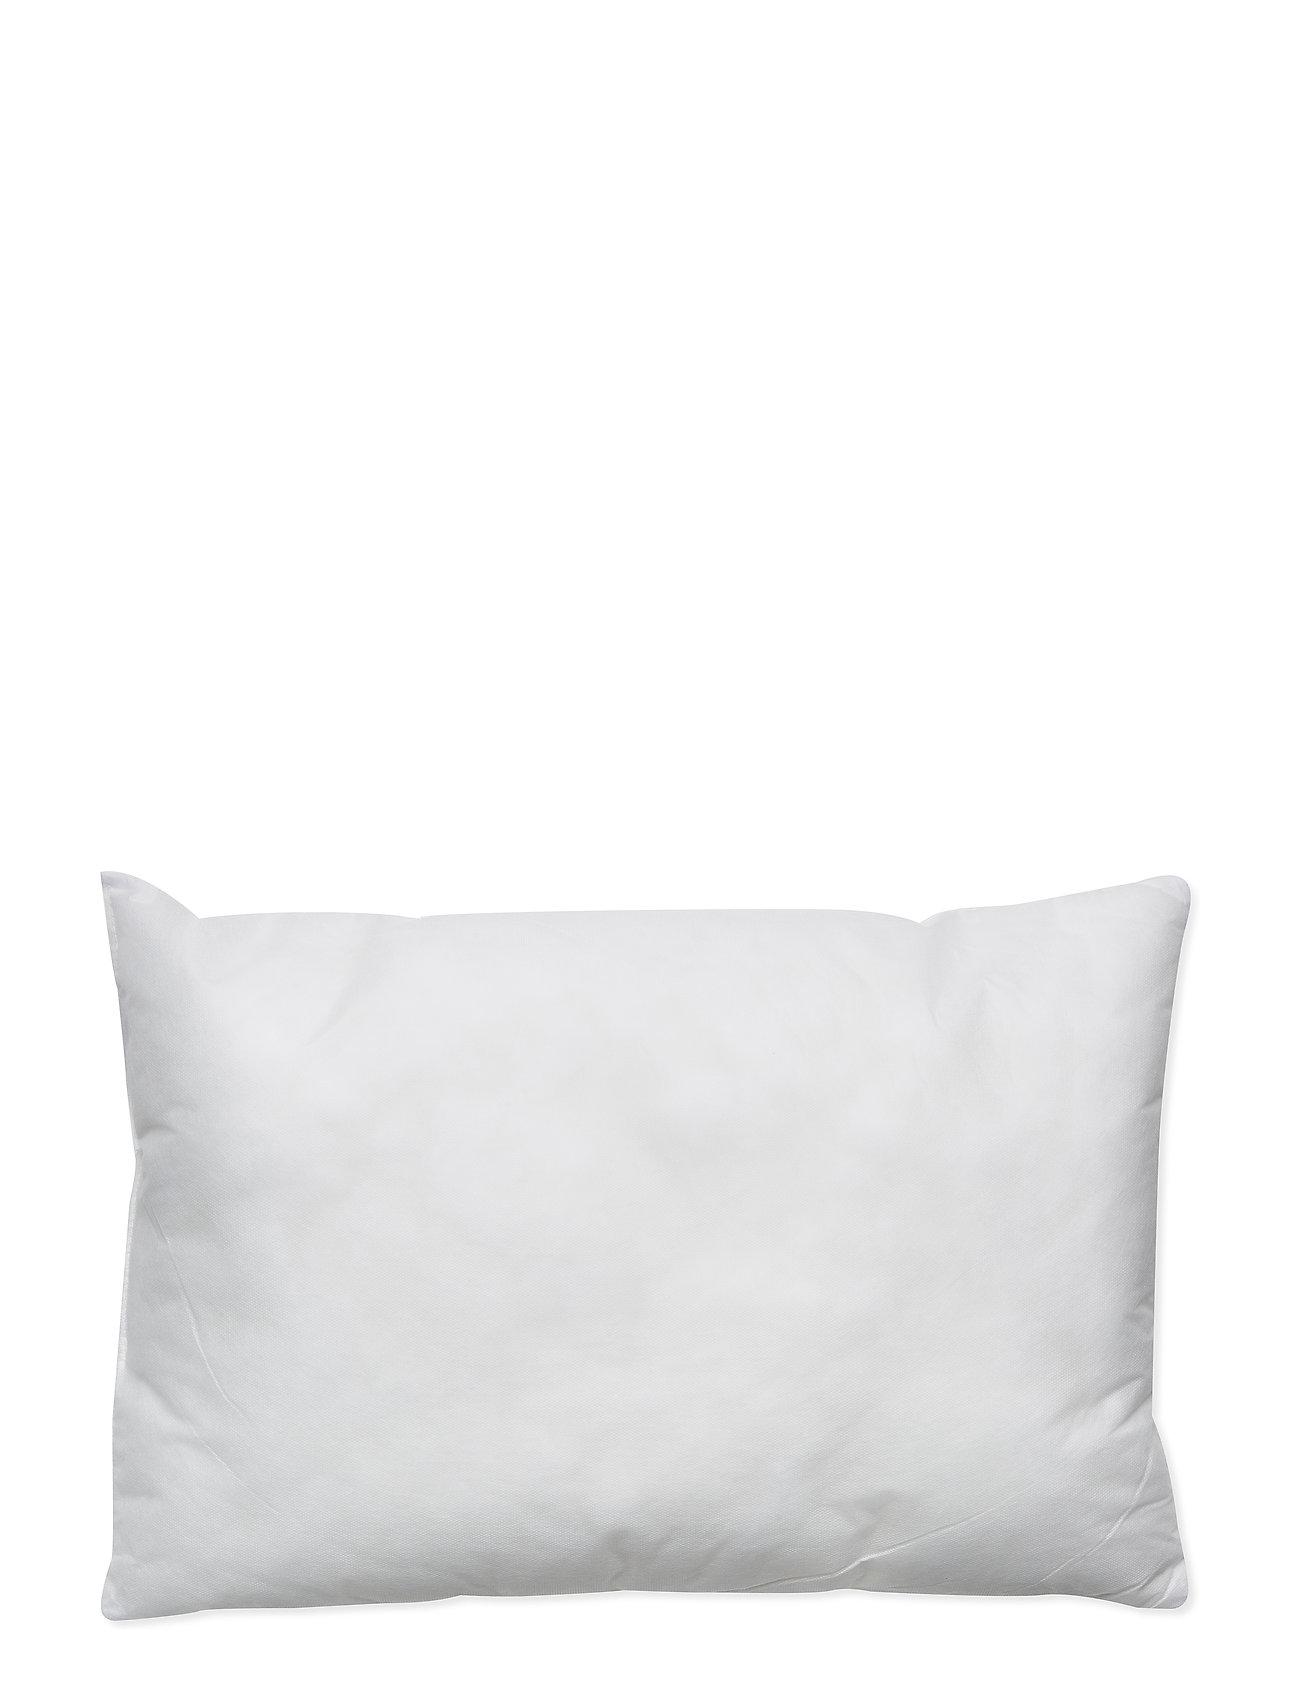 Gripsholm INNER CUSHION - WHITE